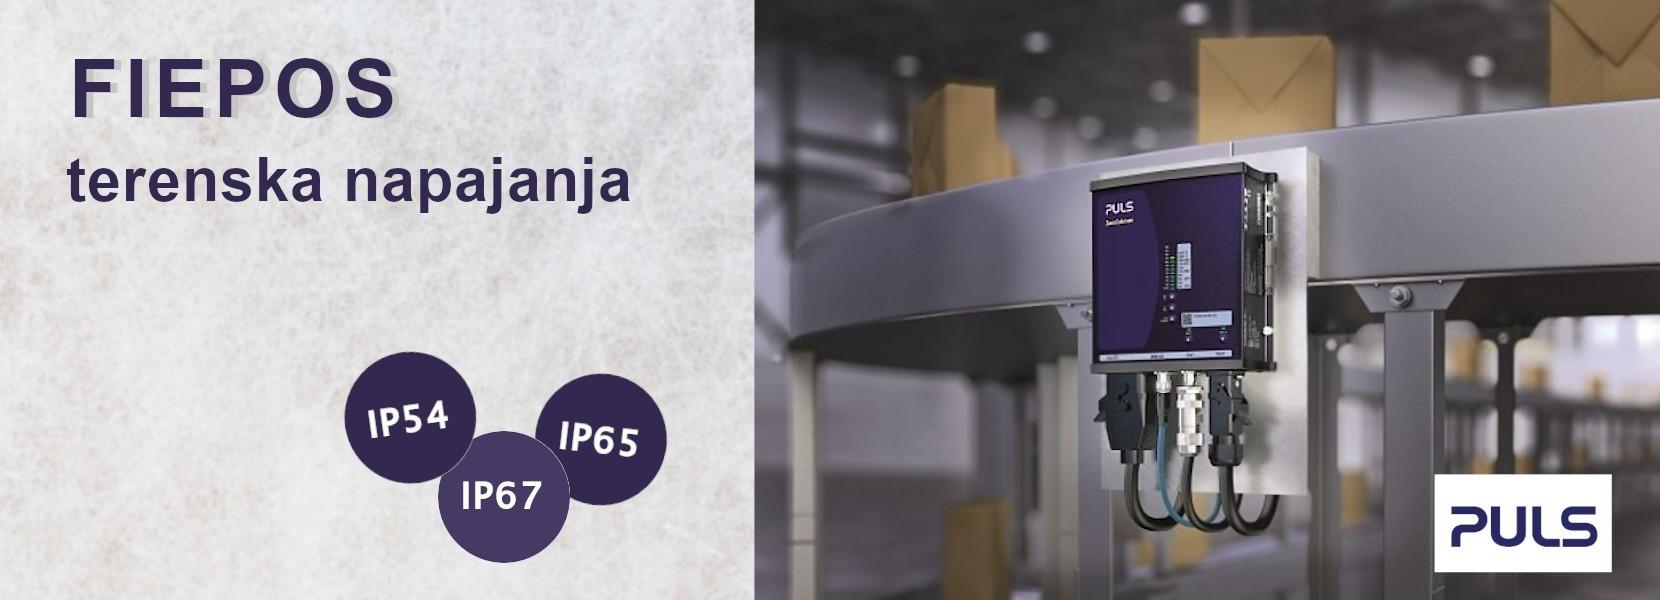 FIEPOS – IP54, IP65 i IP67 terenska napajanja